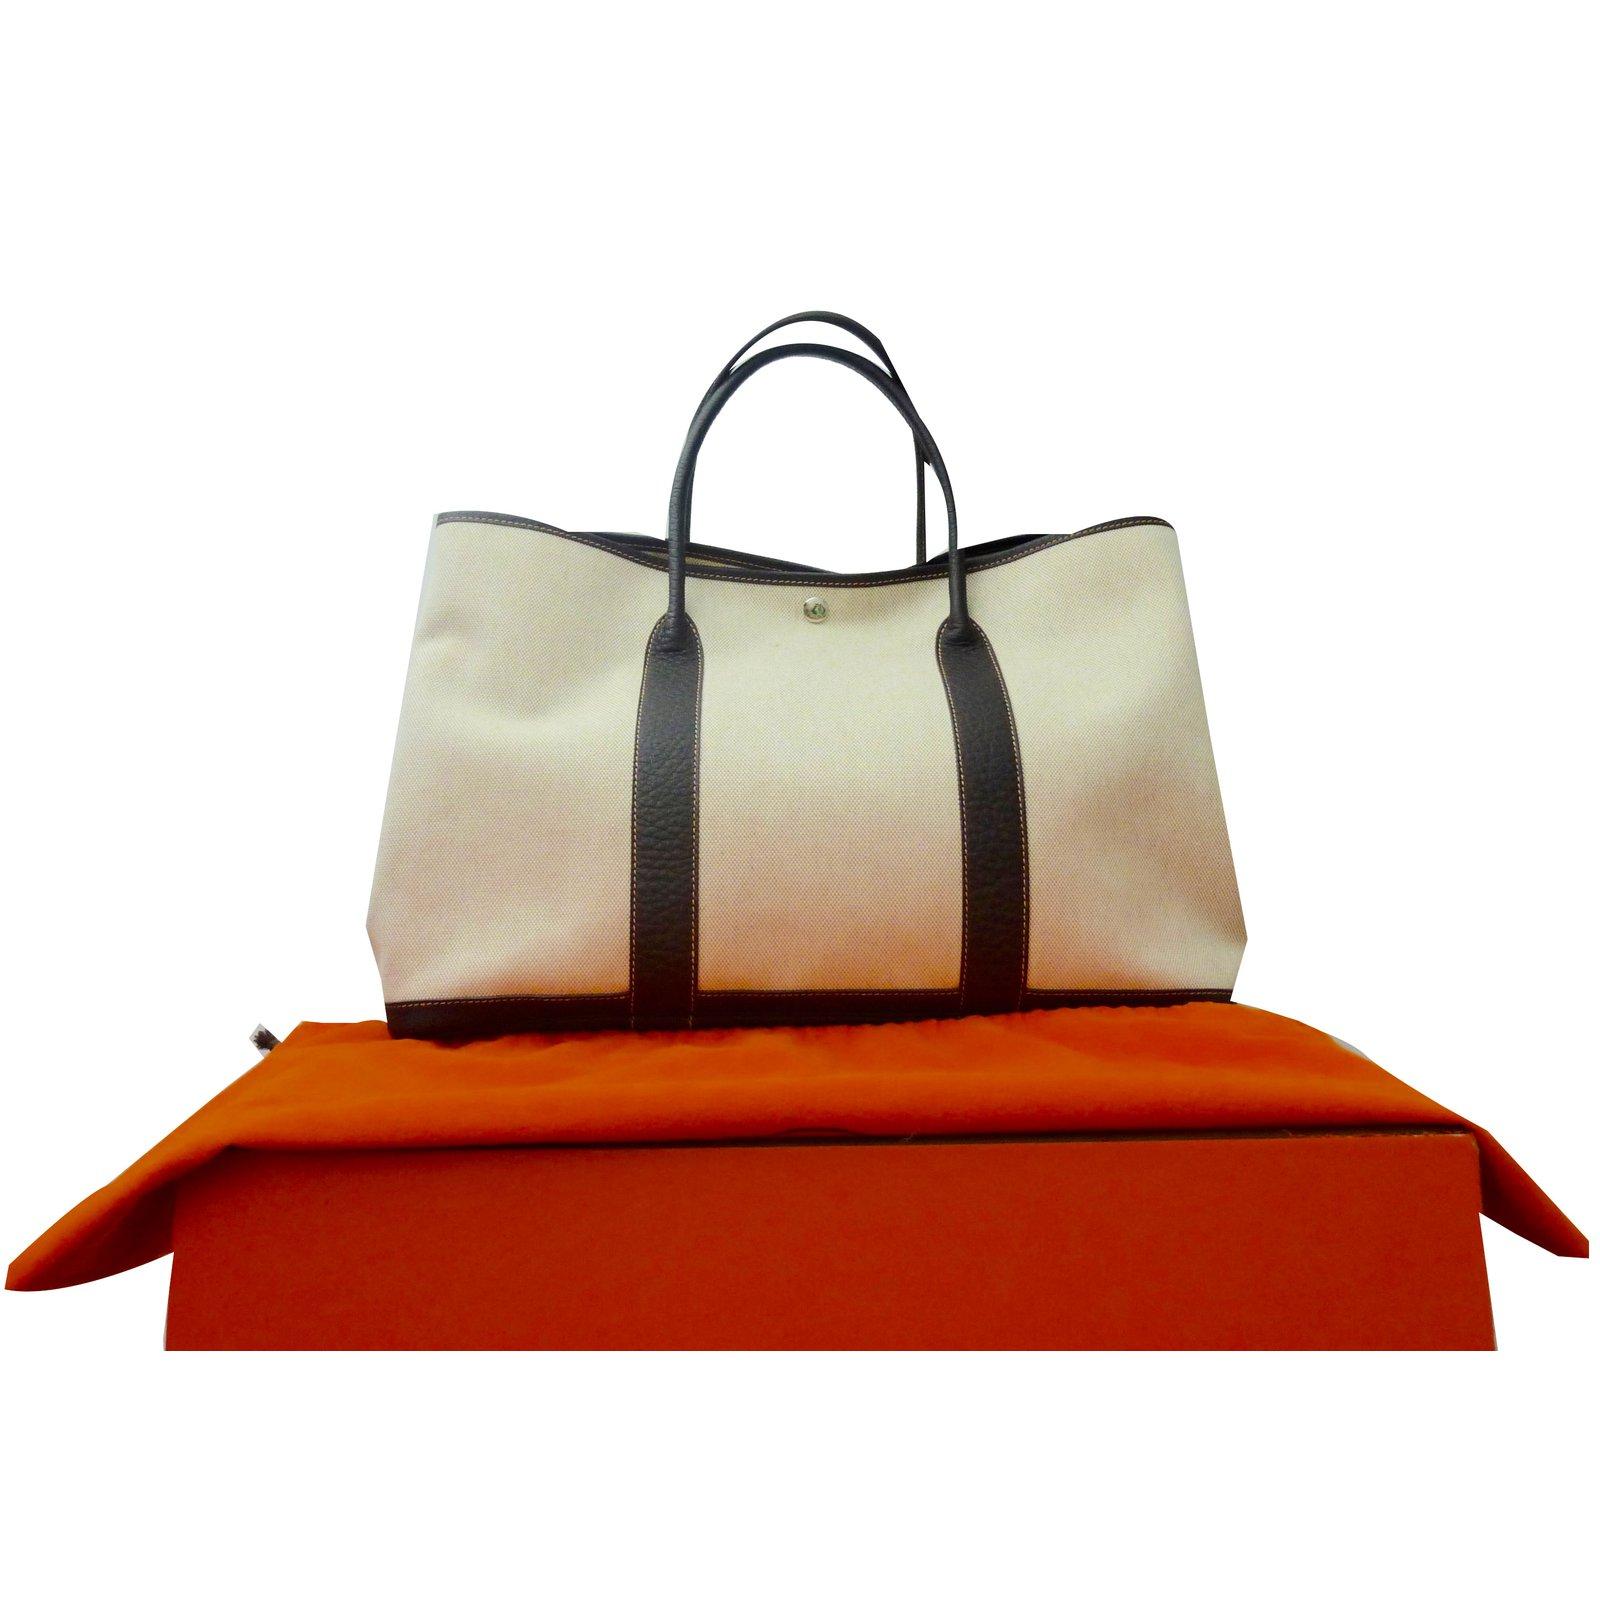 645cbe0642f2 ... where to buy hermès garden party gm handbags leathercloth brownbeige  ref.55580 1df64 2c857